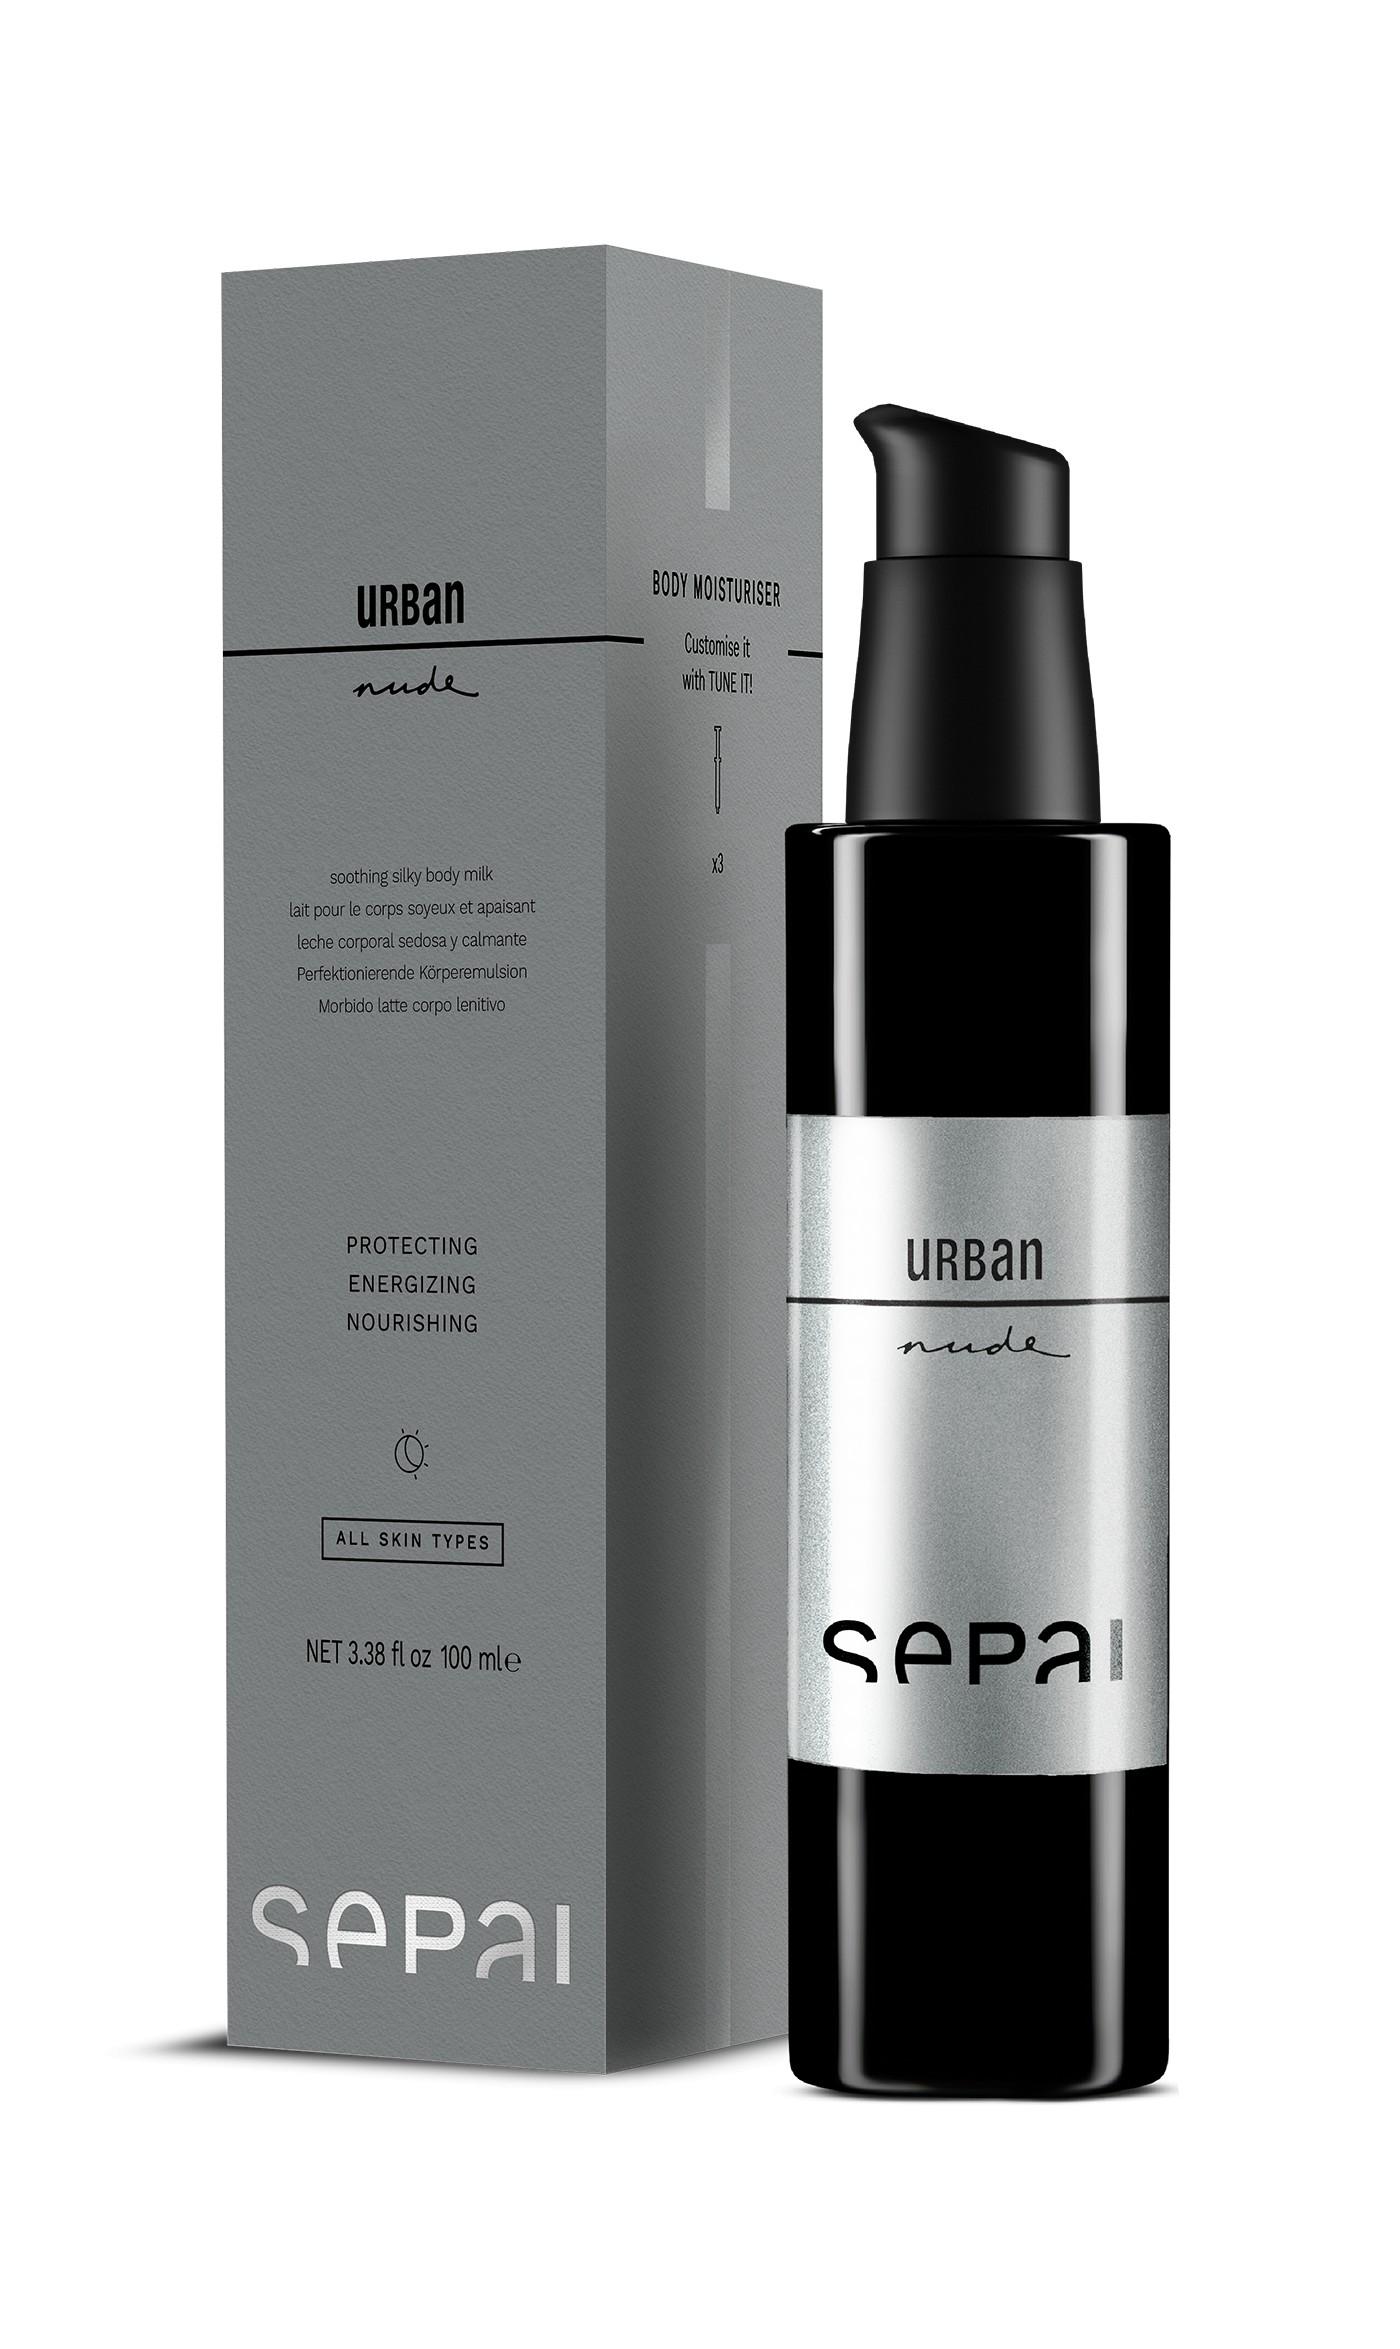 Urban Nude - SEPAI